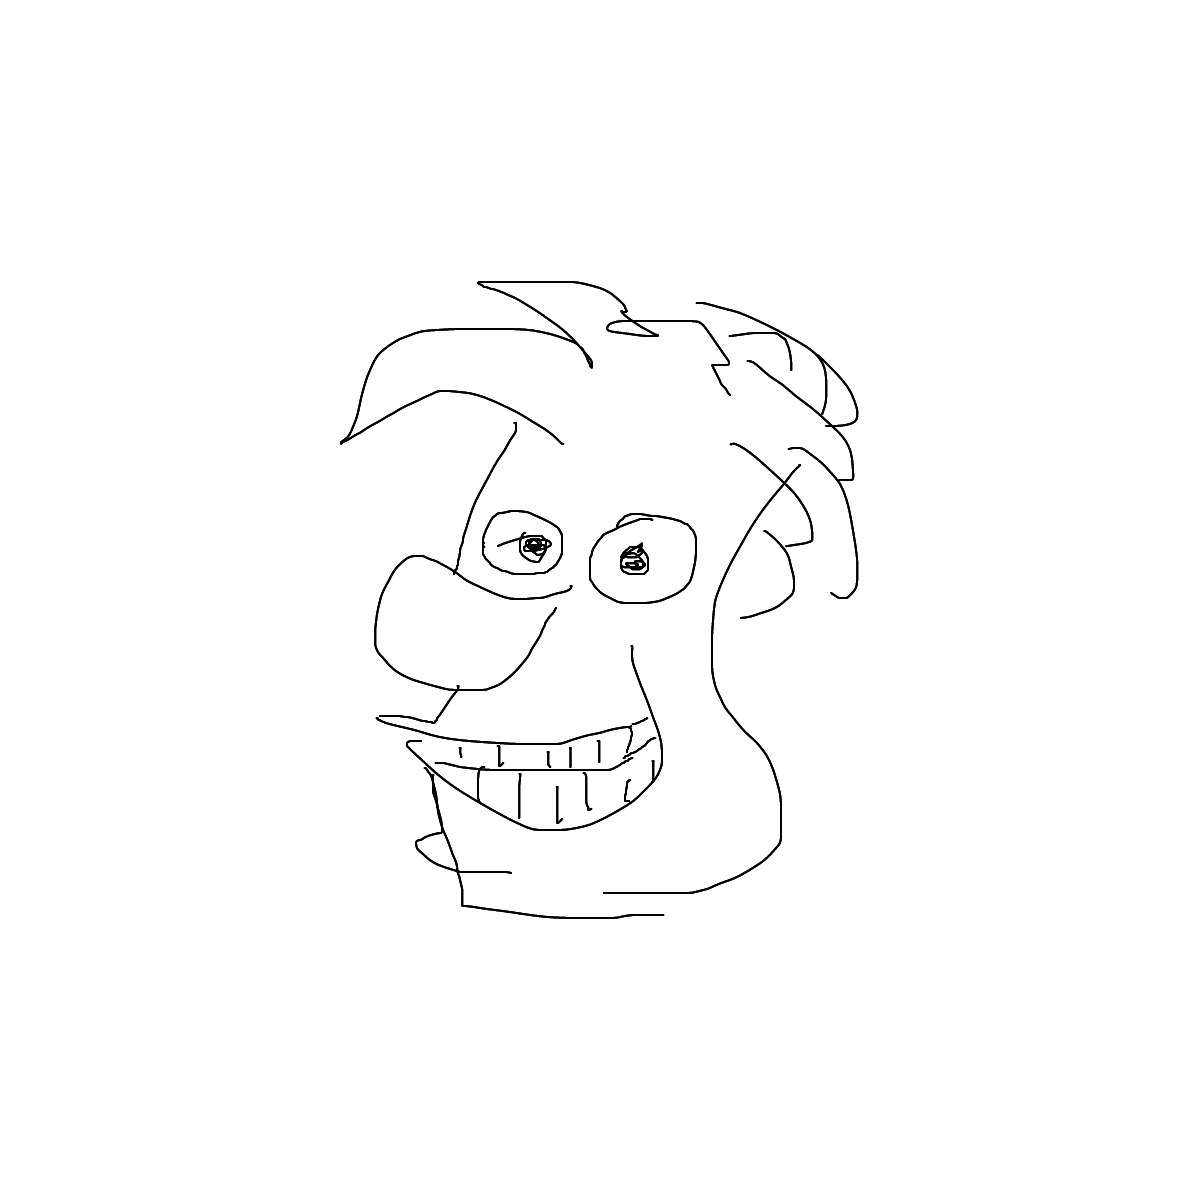 BAAAM drawing#1128 lat:50.9647712707519500lng: 22.1571159362792970